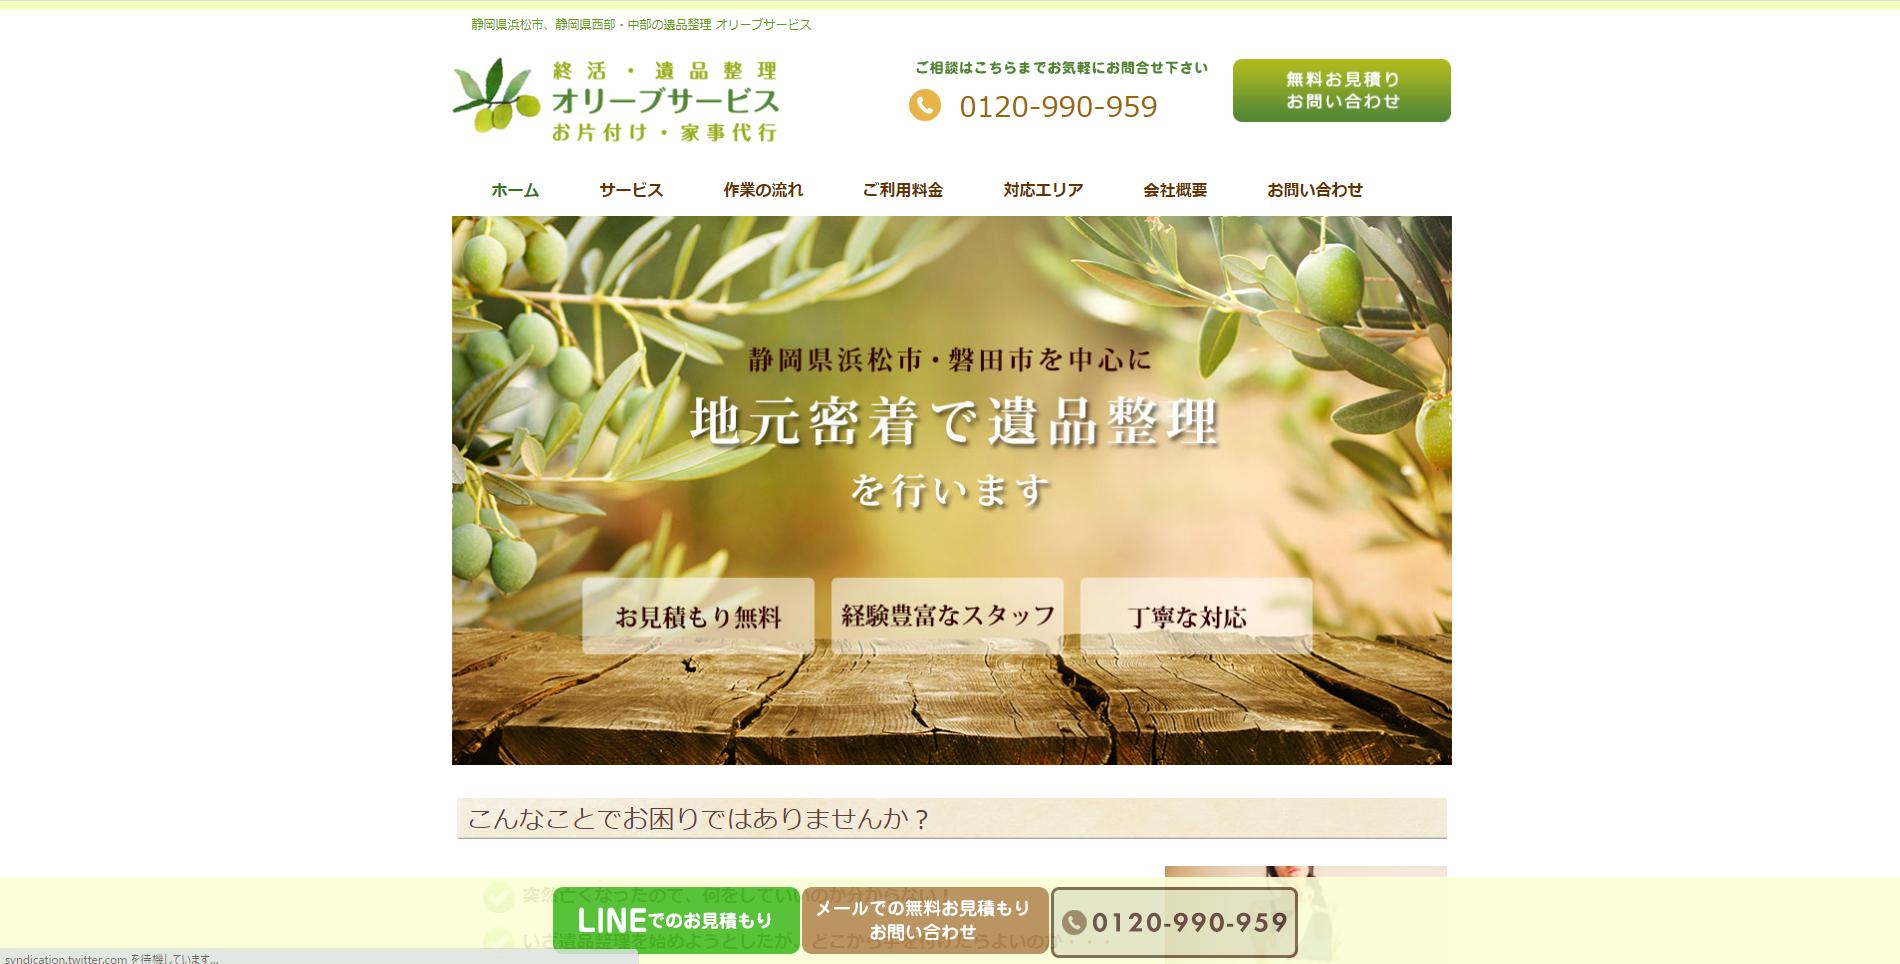 静岡県浜松市、静岡県西部・中部の遺品整理 オリーブサービス